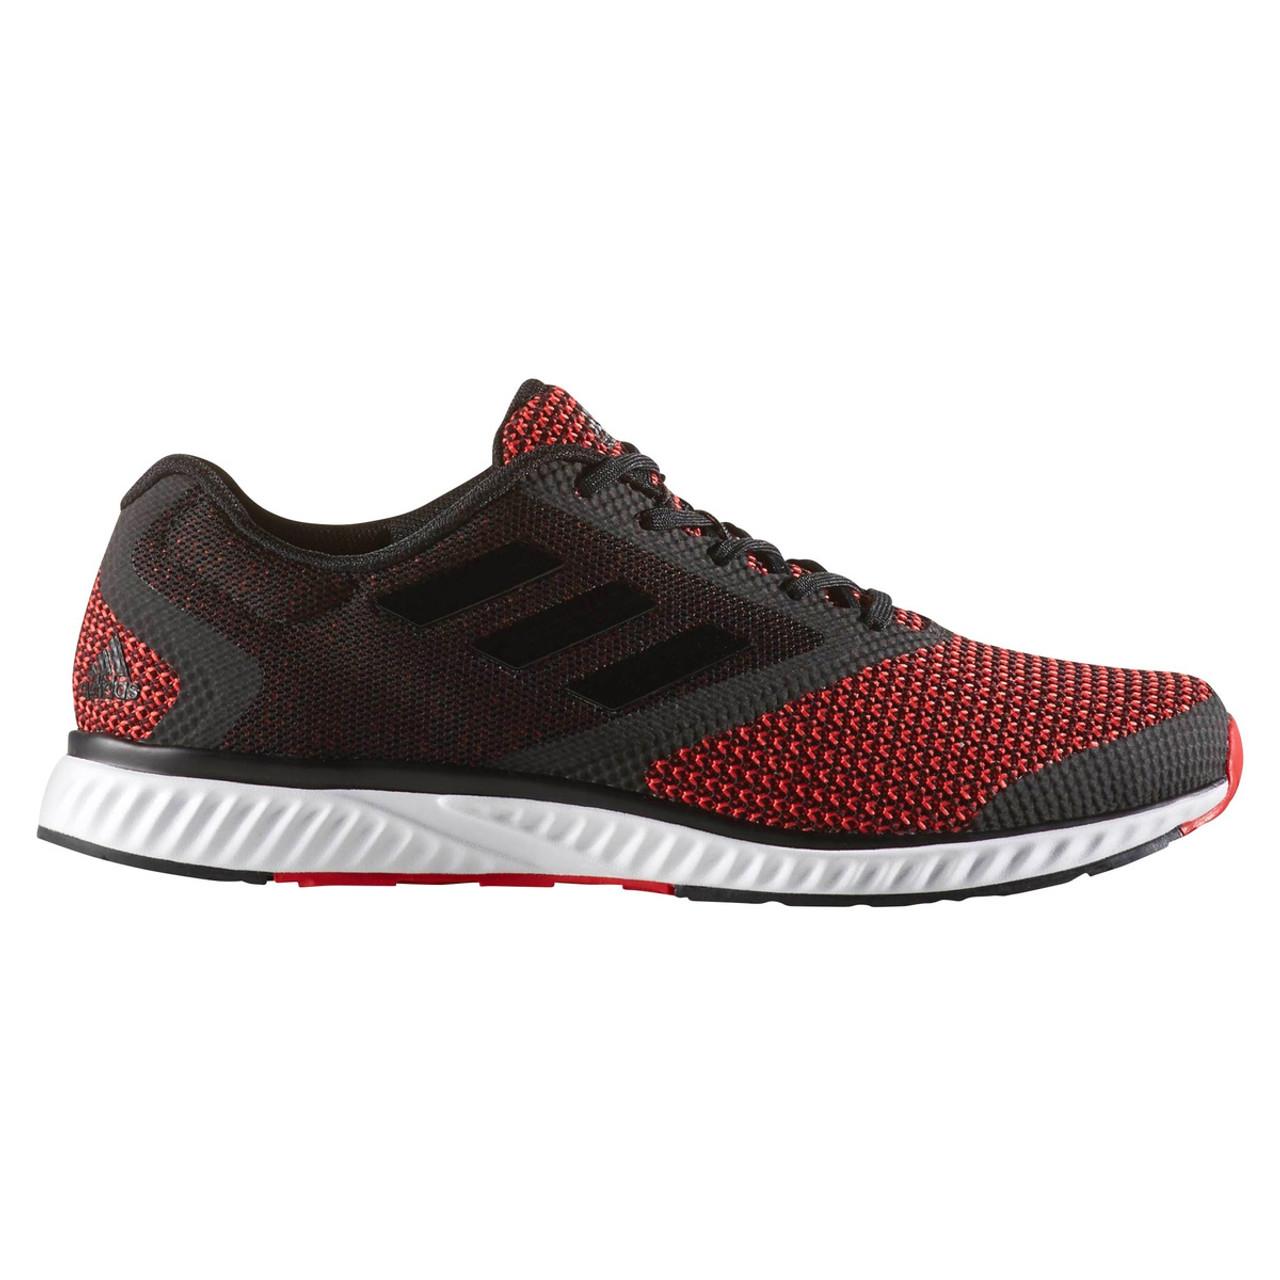 super popular 6bf24 dd665 Adidas Edge RC Mens Running Shoes CG4281 - Black, Red ...